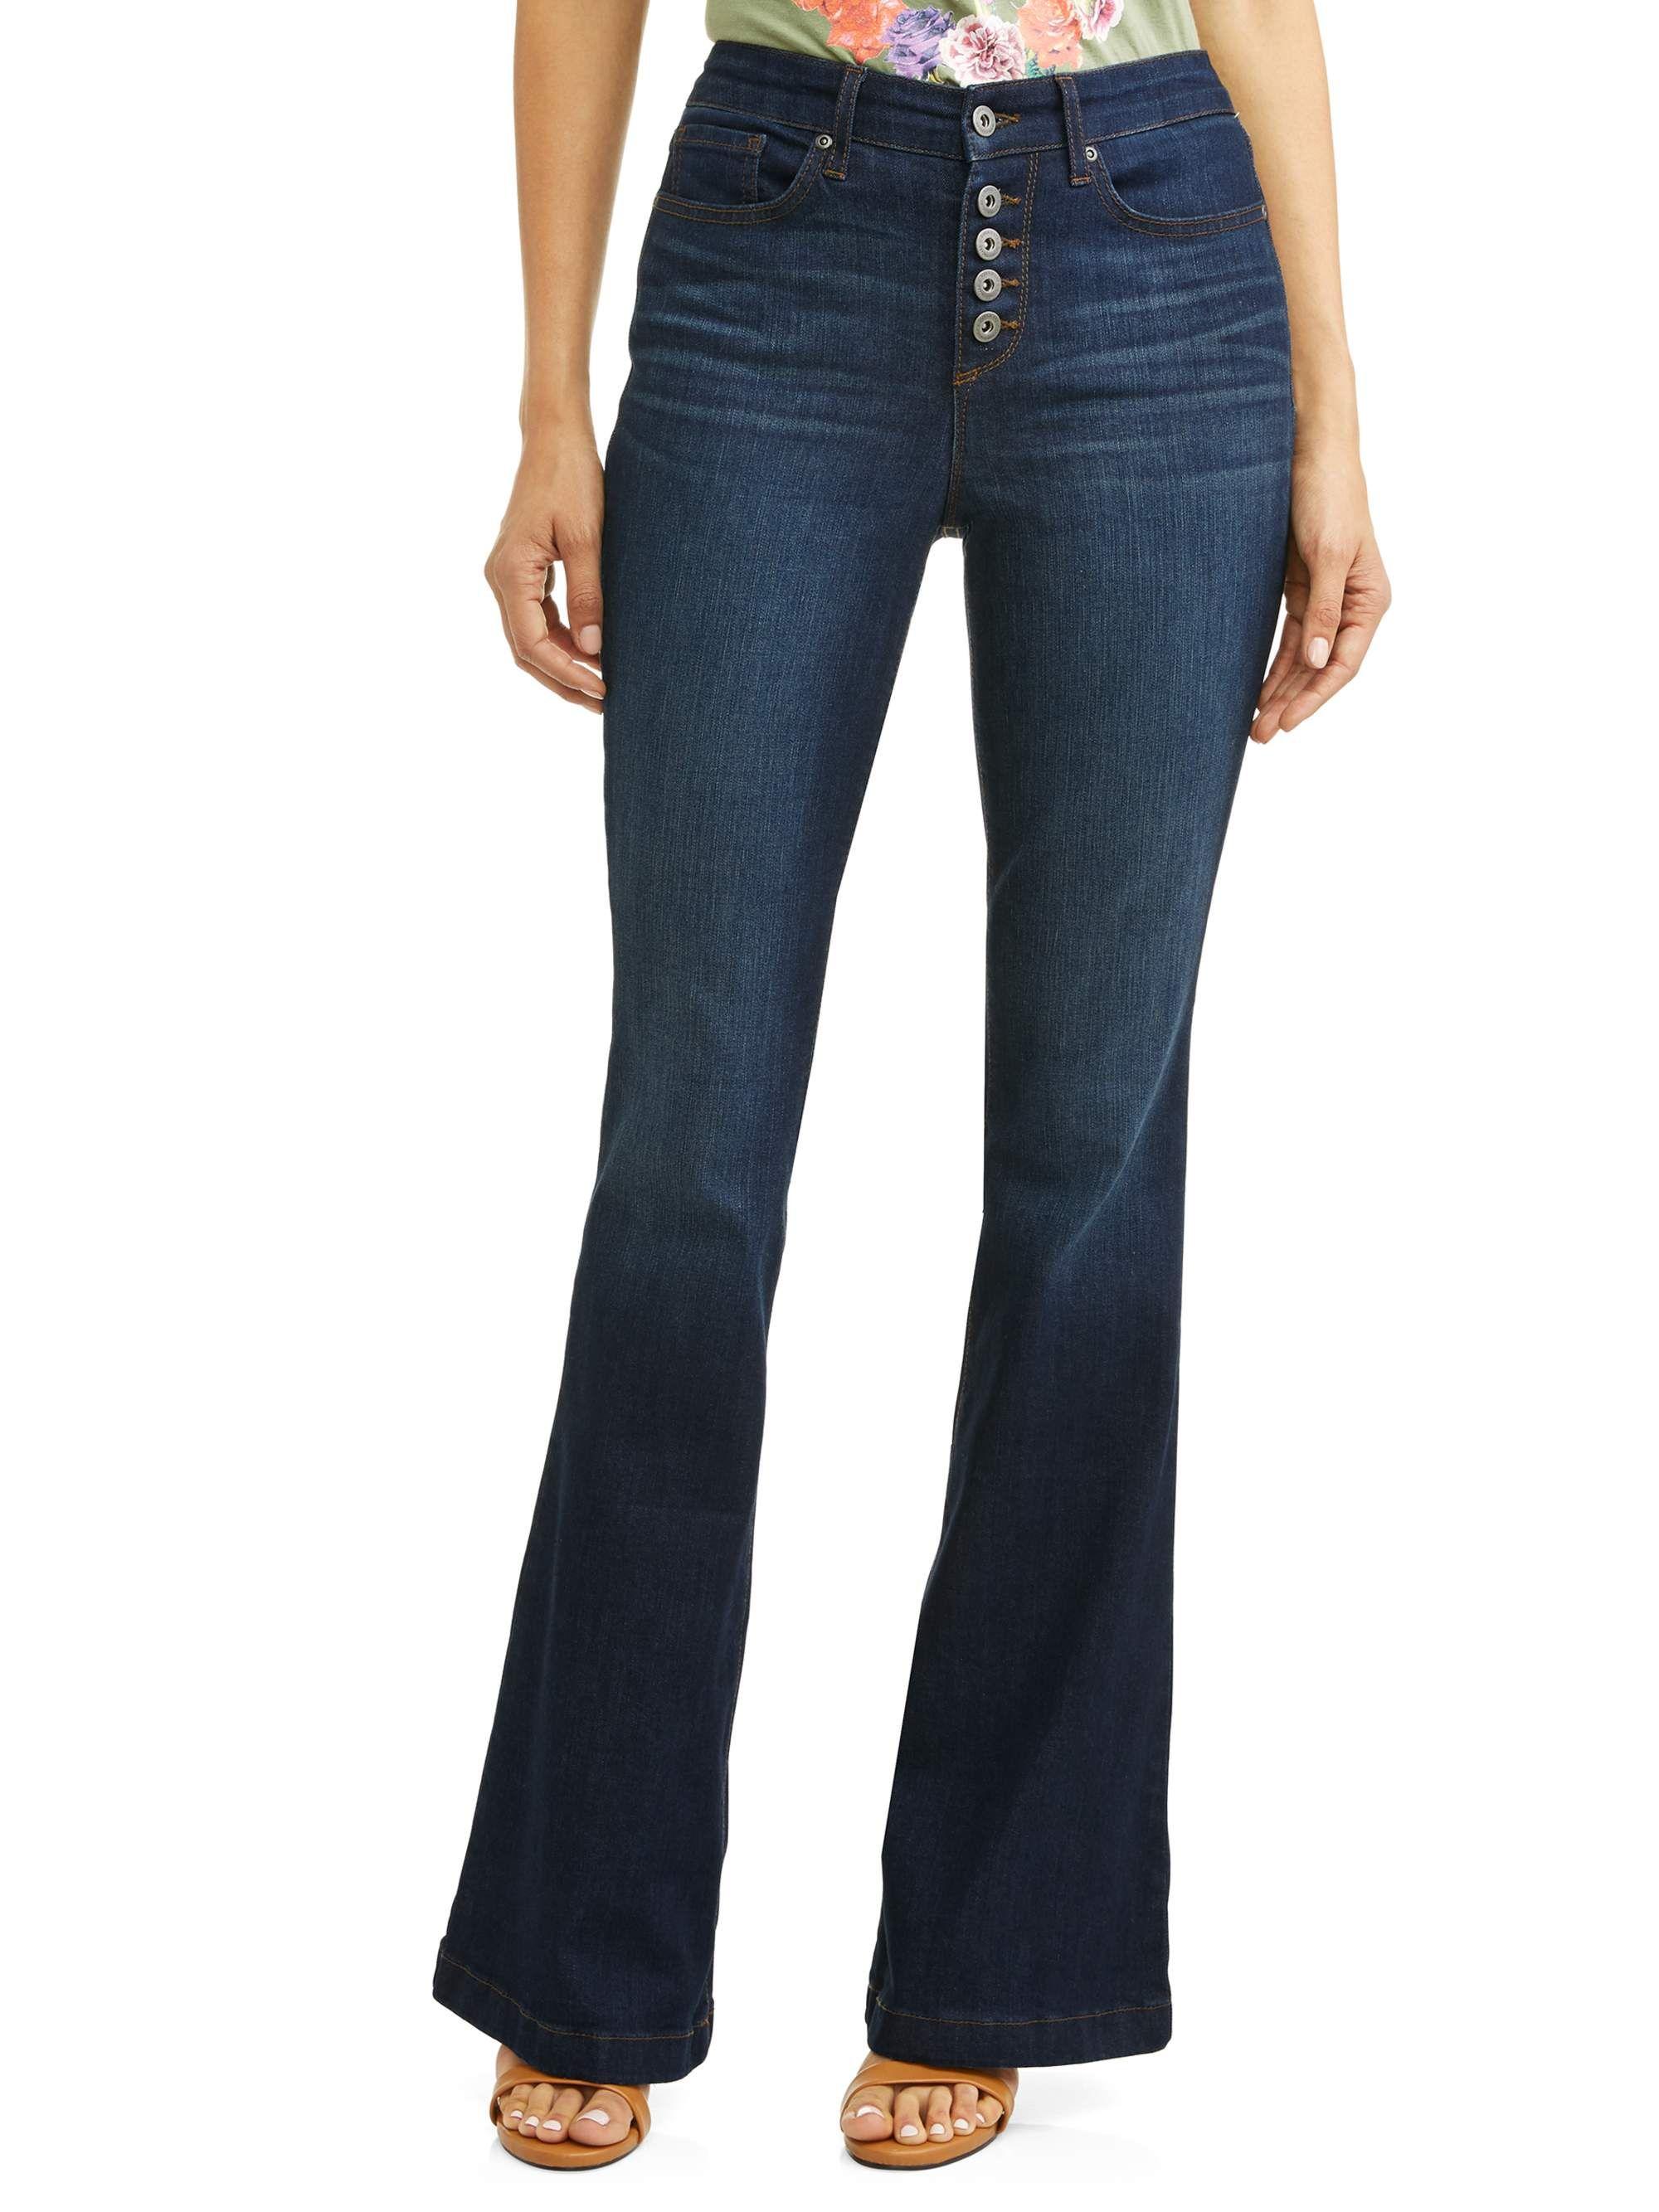 6904171e728b9 High Waist Stretch Flare Jean. Melisa High Waist Stretch Flare Jean Women s  (Dark Indigo Wash). Sofía Jeans by Sofía Vergara ...